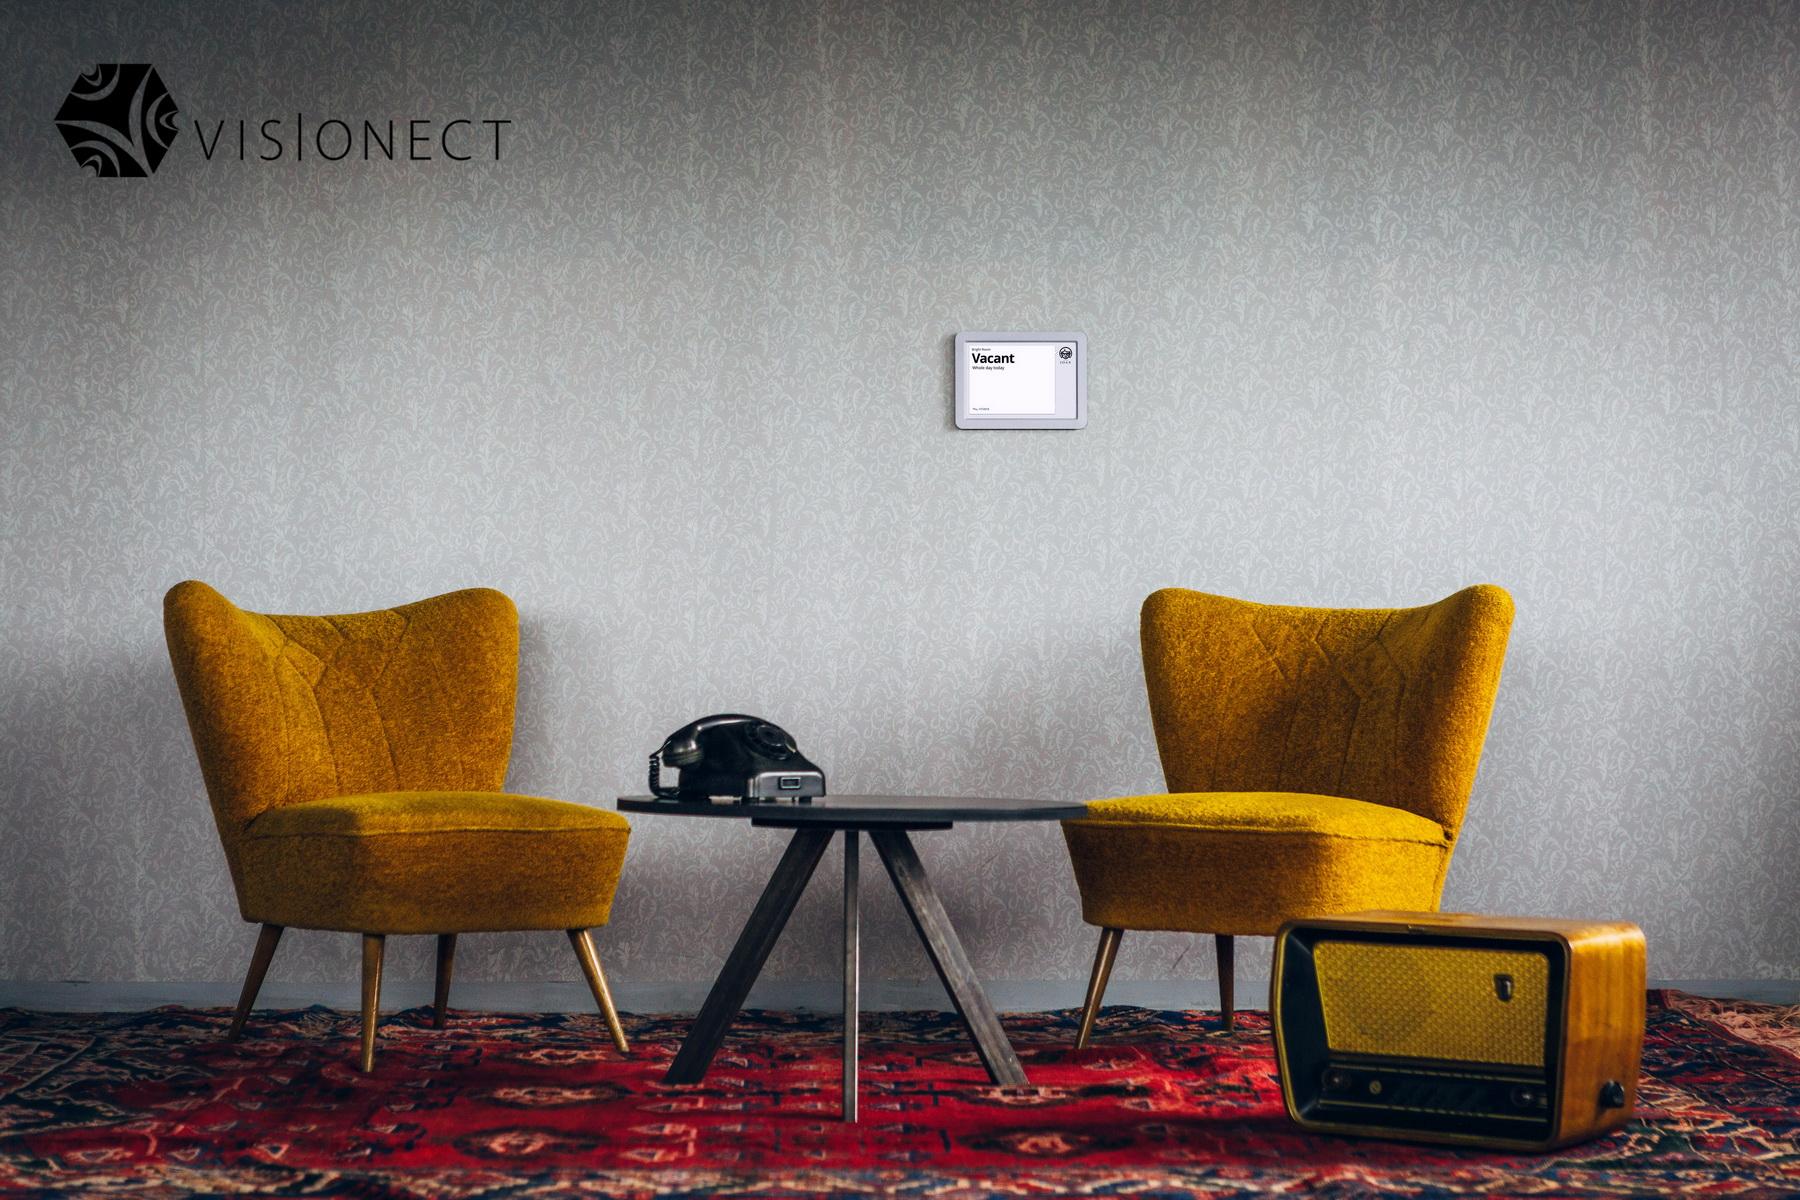 andraz_blaznik-advertising-09.jpg